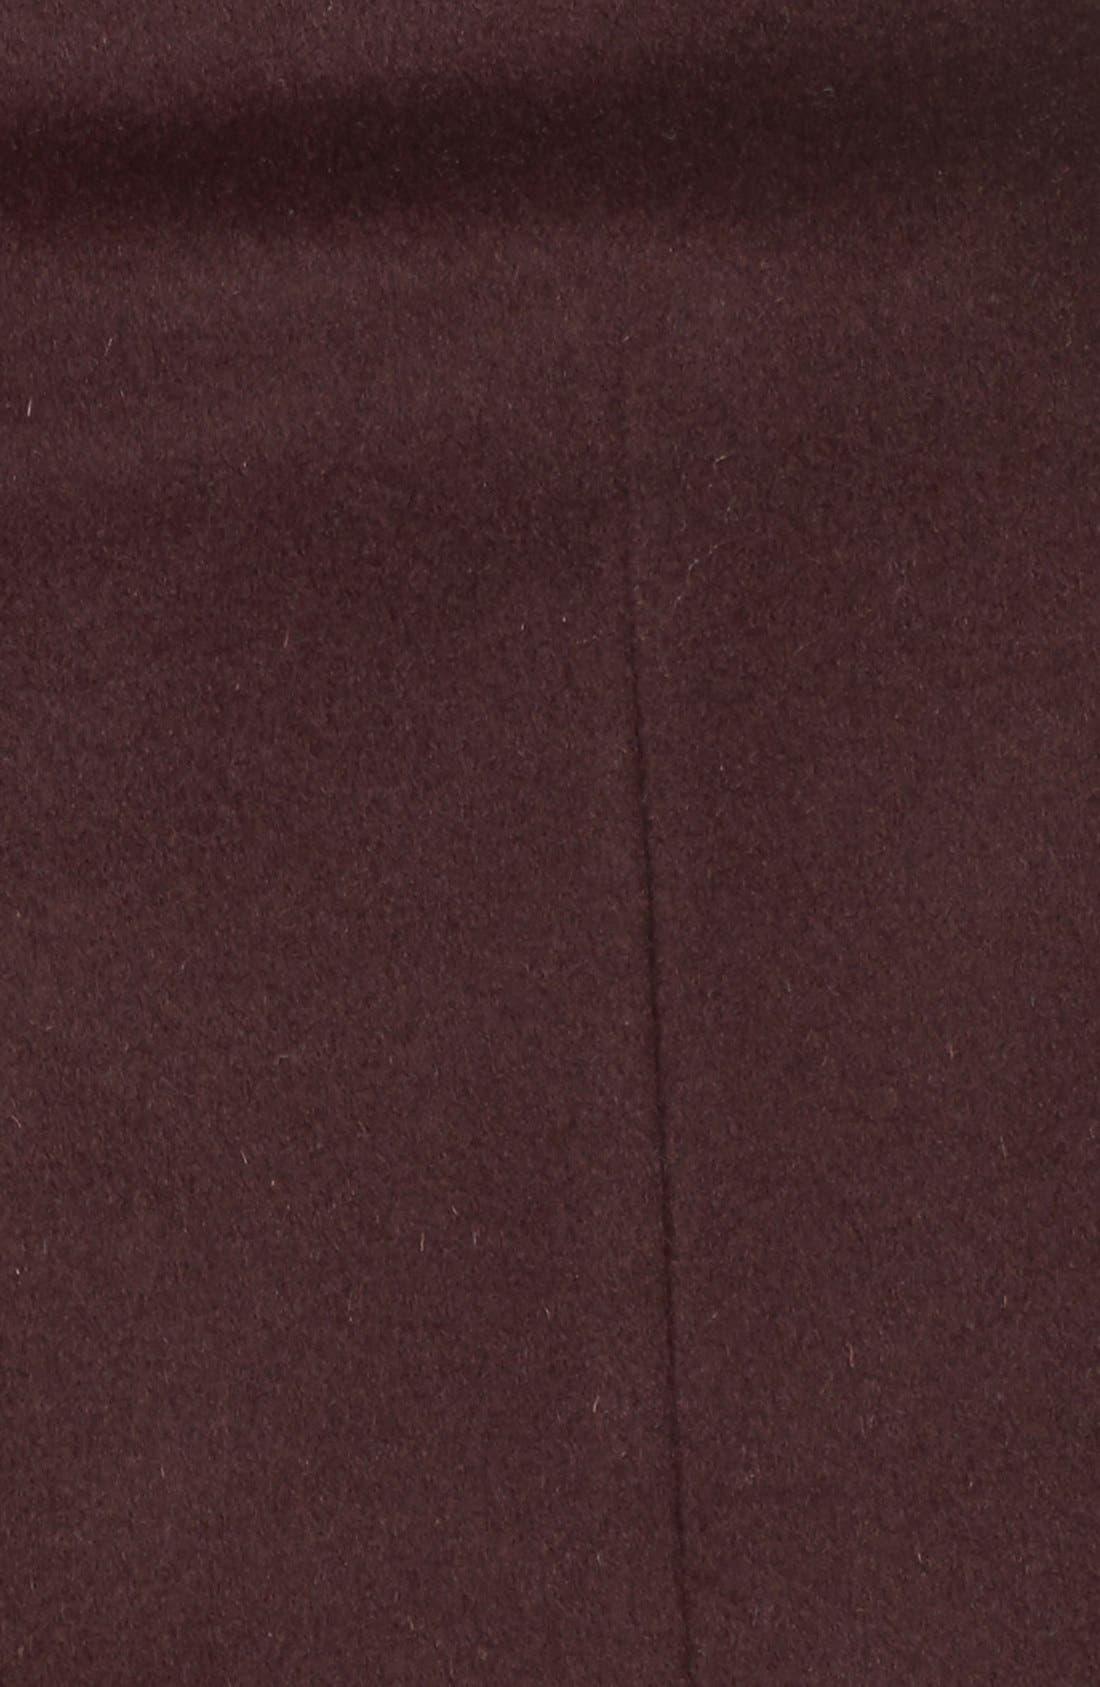 T Tahari Wool Blend Belted Wrap Coat,                             Alternate thumbnail 51, color,